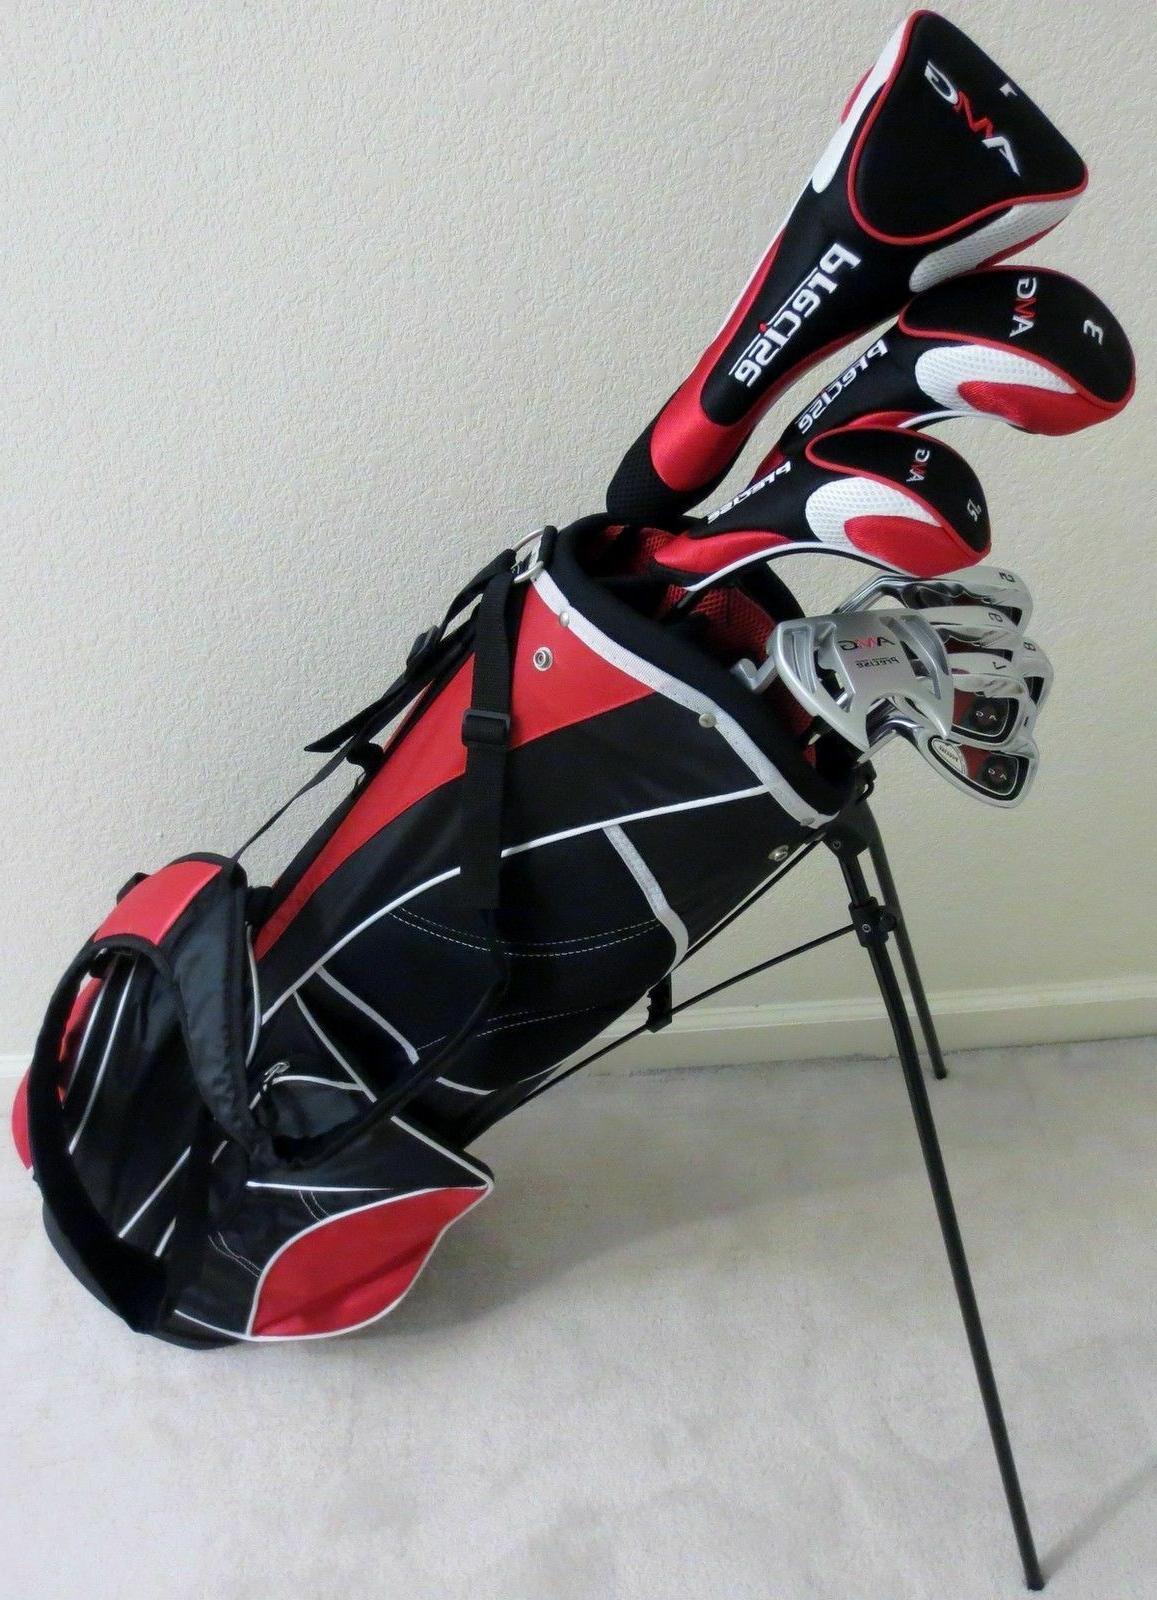 new senior graphite golf set complete driver